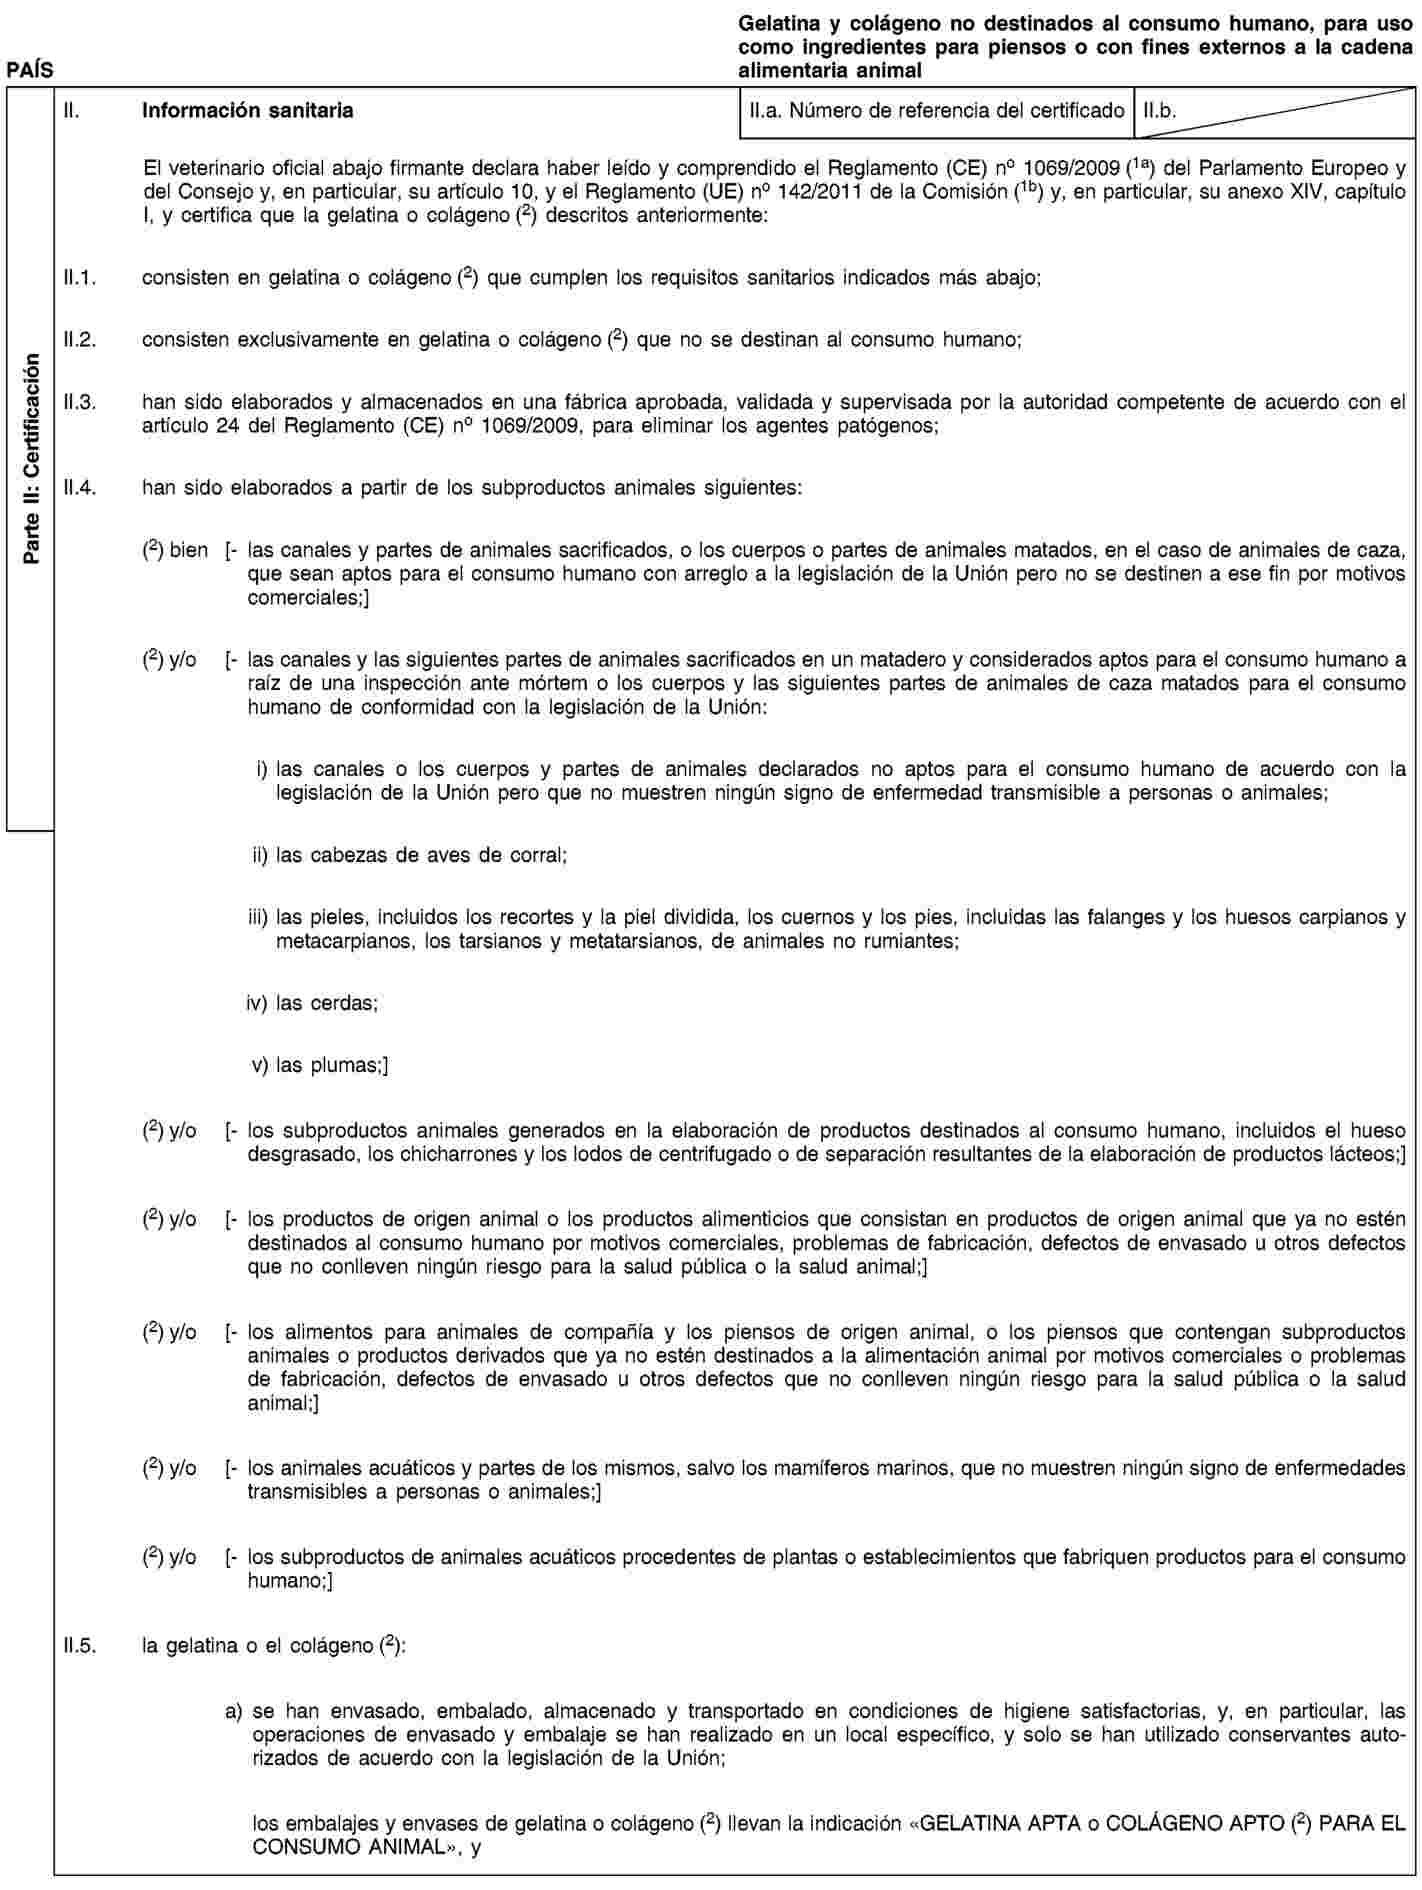 Imagen: https://eur-lex.europa.eu/resource.html?uri=uriserv:OJ.L_.2011.054.01.0001.01.SPA.xhtml.L_2011054ES.01021501.tif.jpg